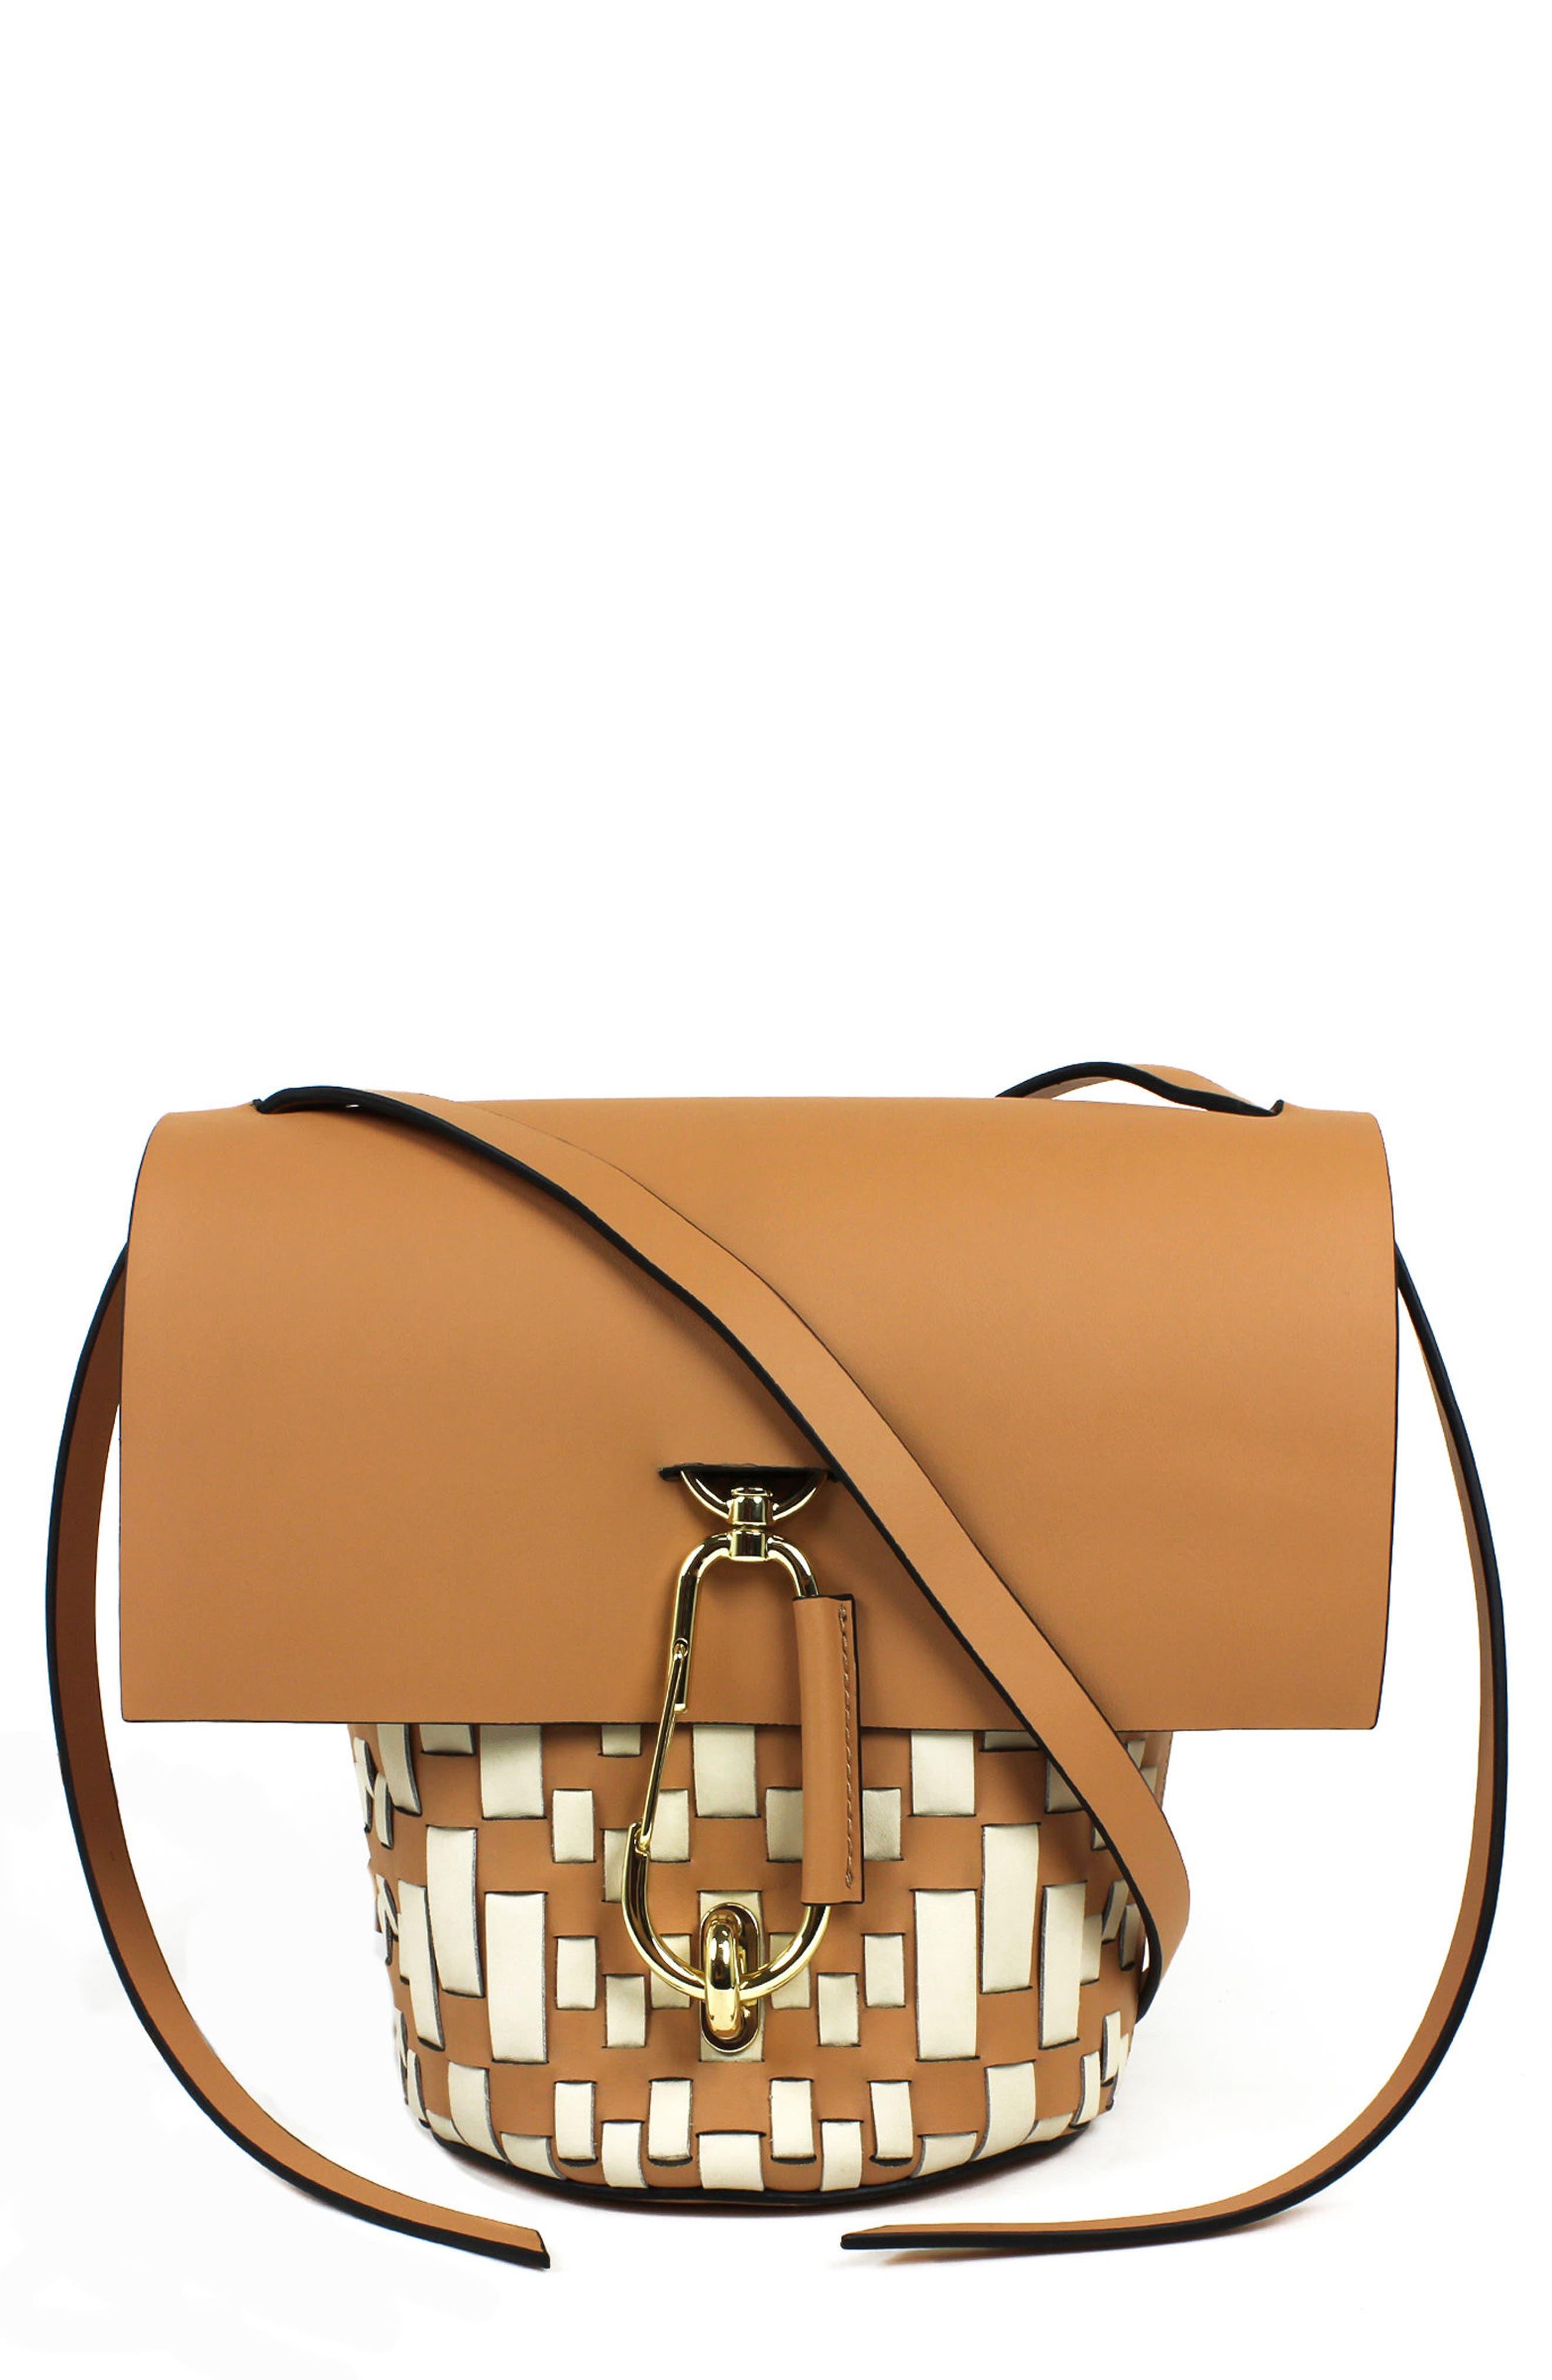 Belay Woven Leather Crossbody Bag,                             Main thumbnail 1, color,                             Vachetta